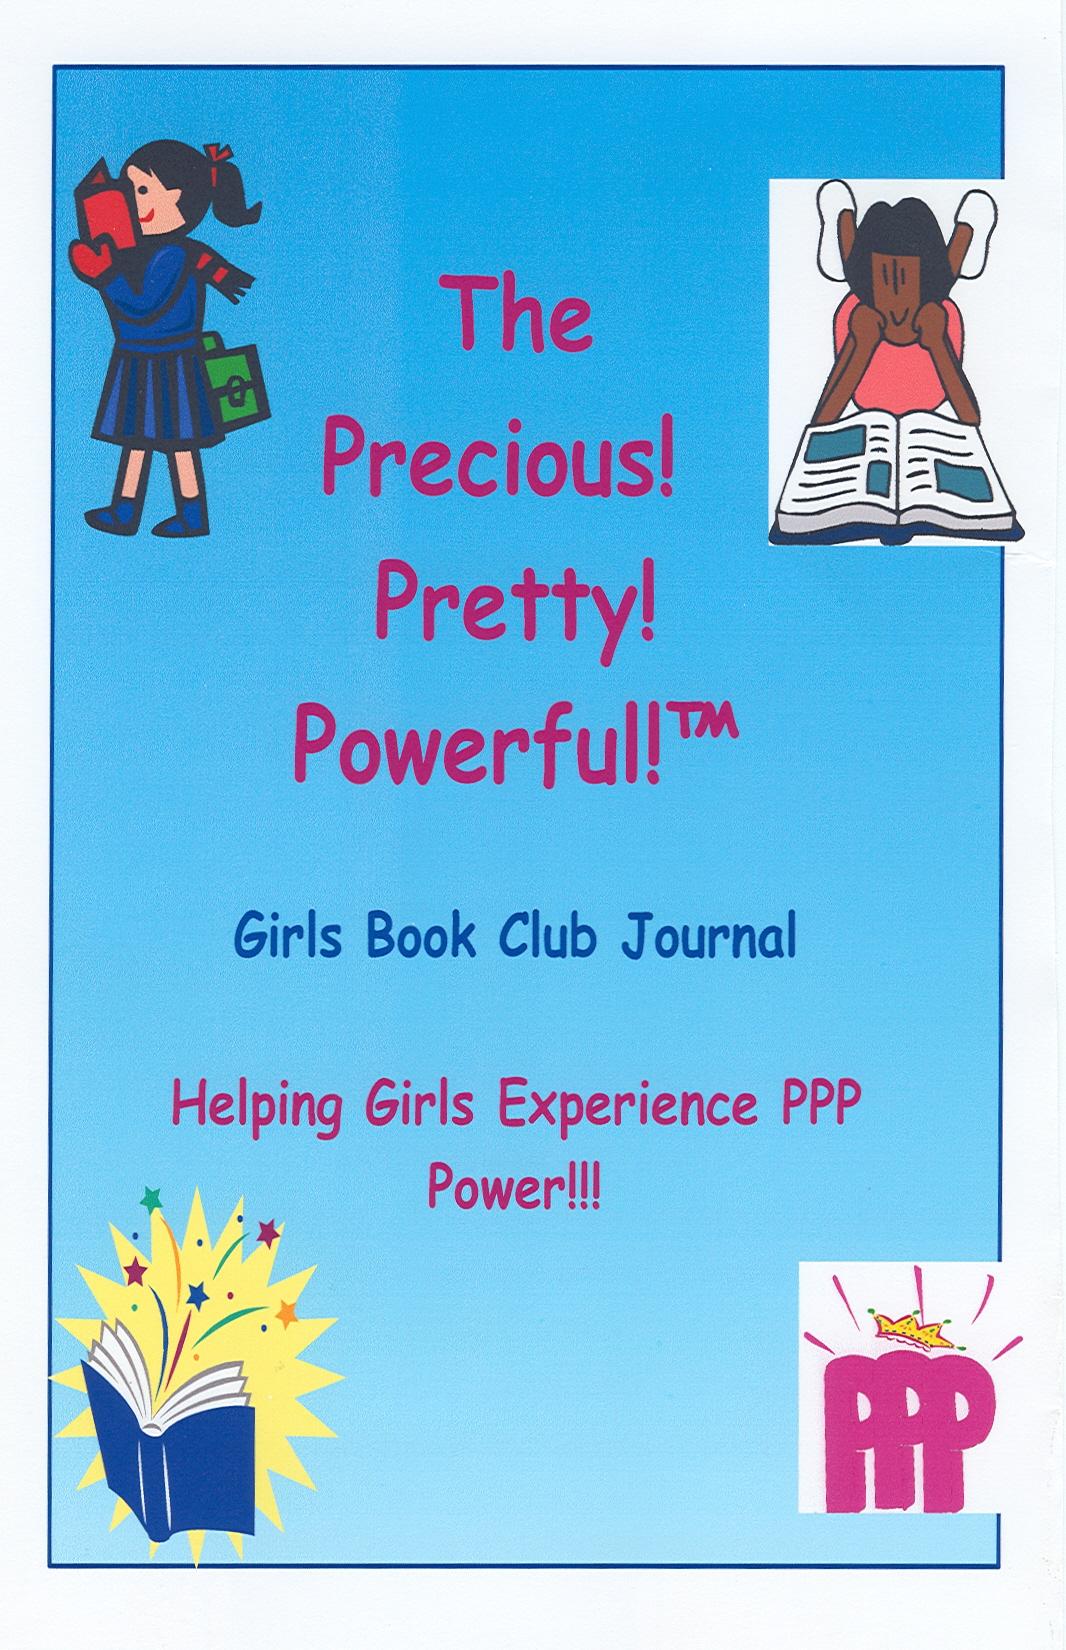 Pretty Book Cover Generator : The precious pretty powerful girls book club helps